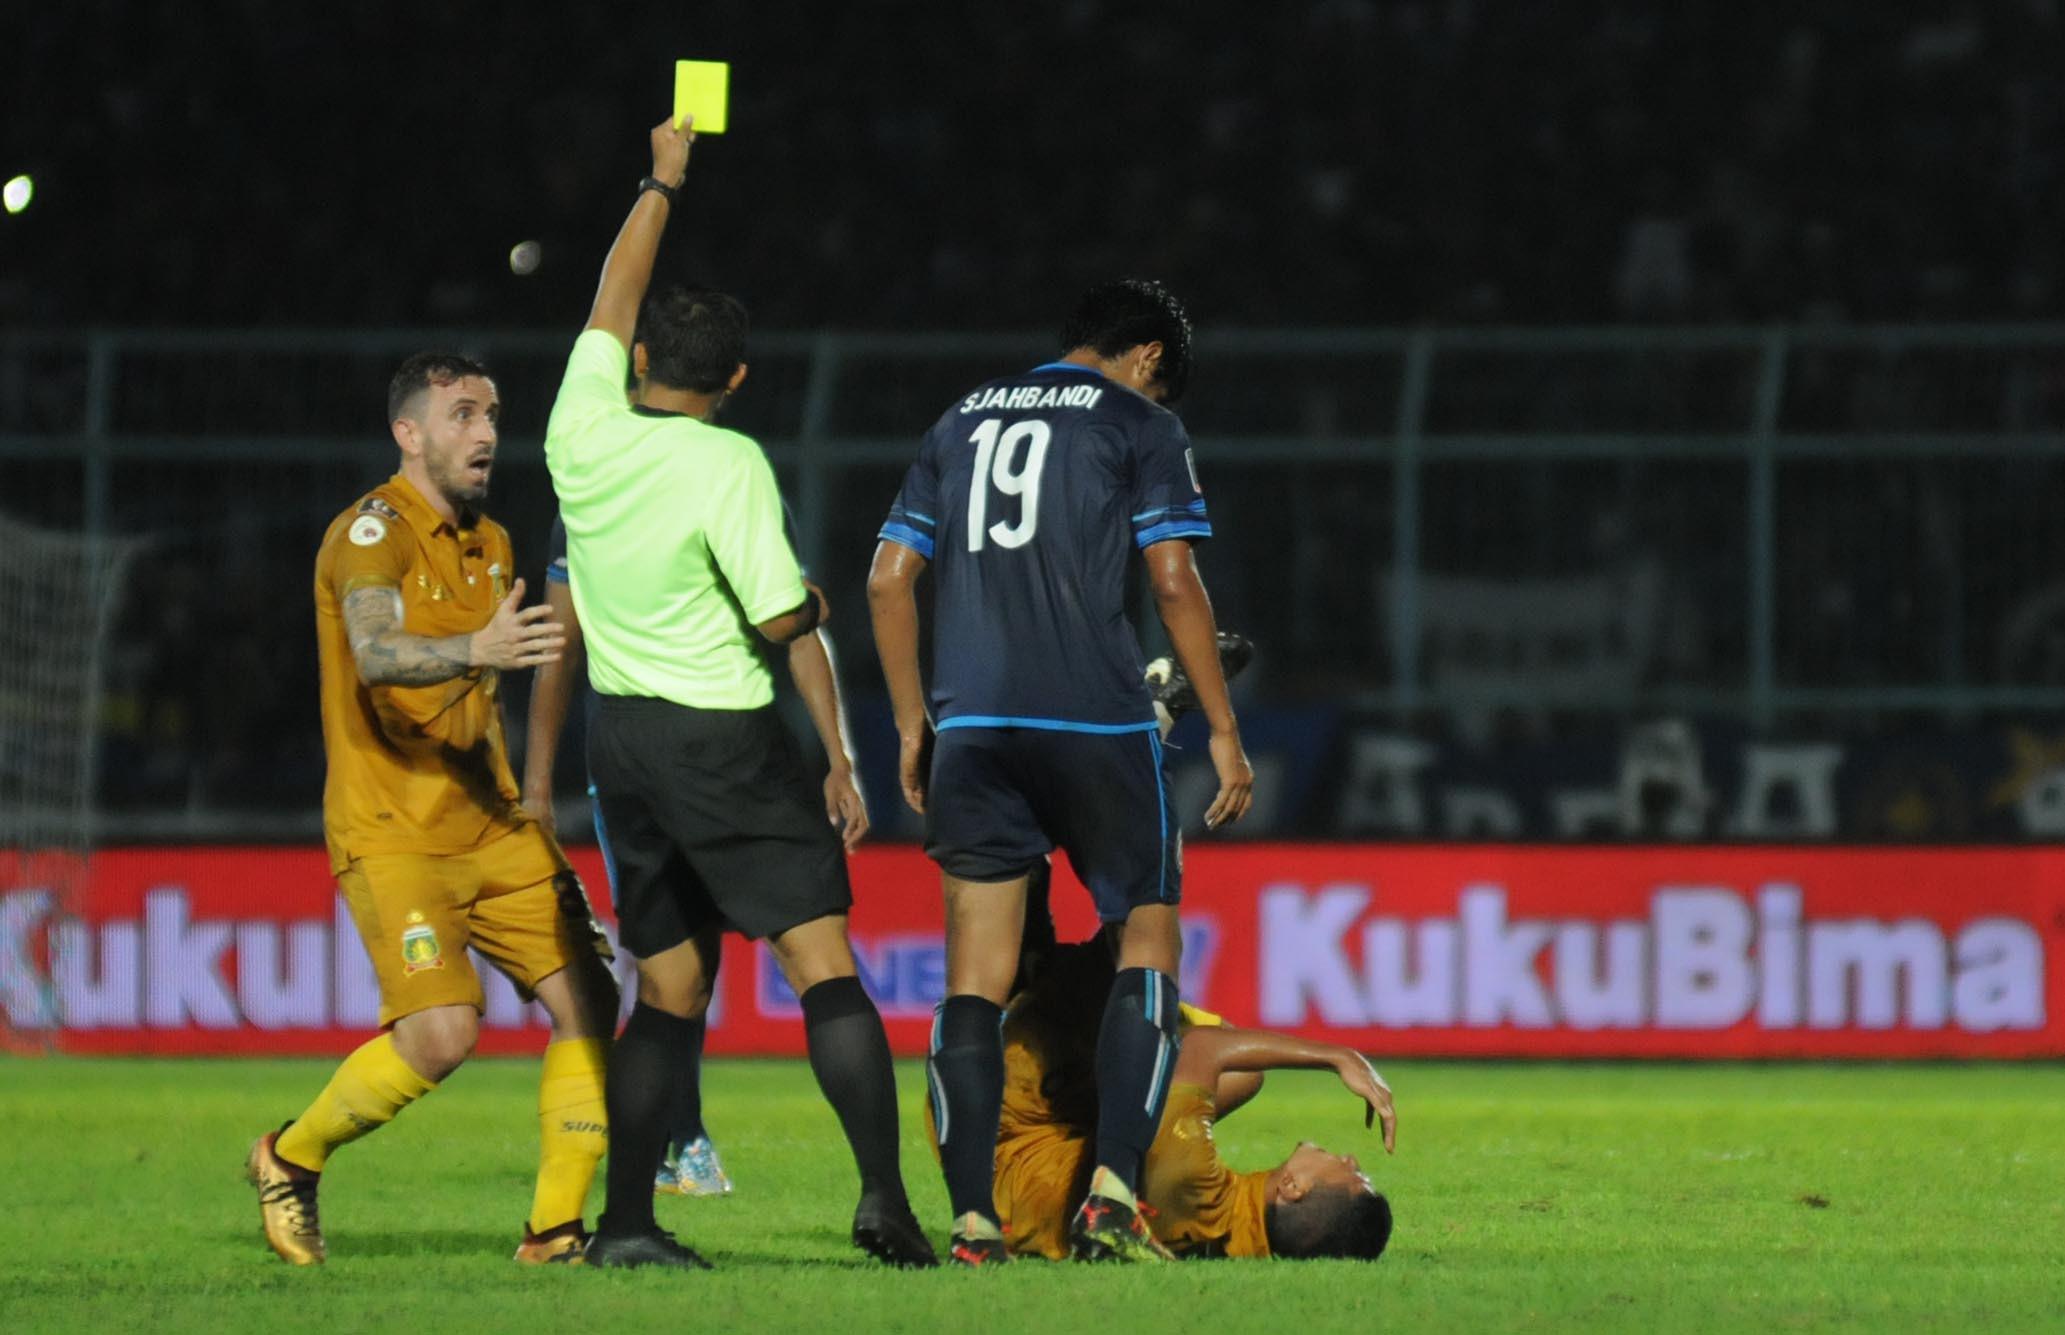 Gelandang Arema FC, Hanif Sjahbandi, melakukan tekel horor ke pemain Bhayangkara FC, T.M Ichsan, dalam pertandingan terakhir Grup E Piala Presiden 2018 di Stadion Kanjuruhan, Malang, Senin (30/1/2018). (Bola.com/Iwan Setiawan)